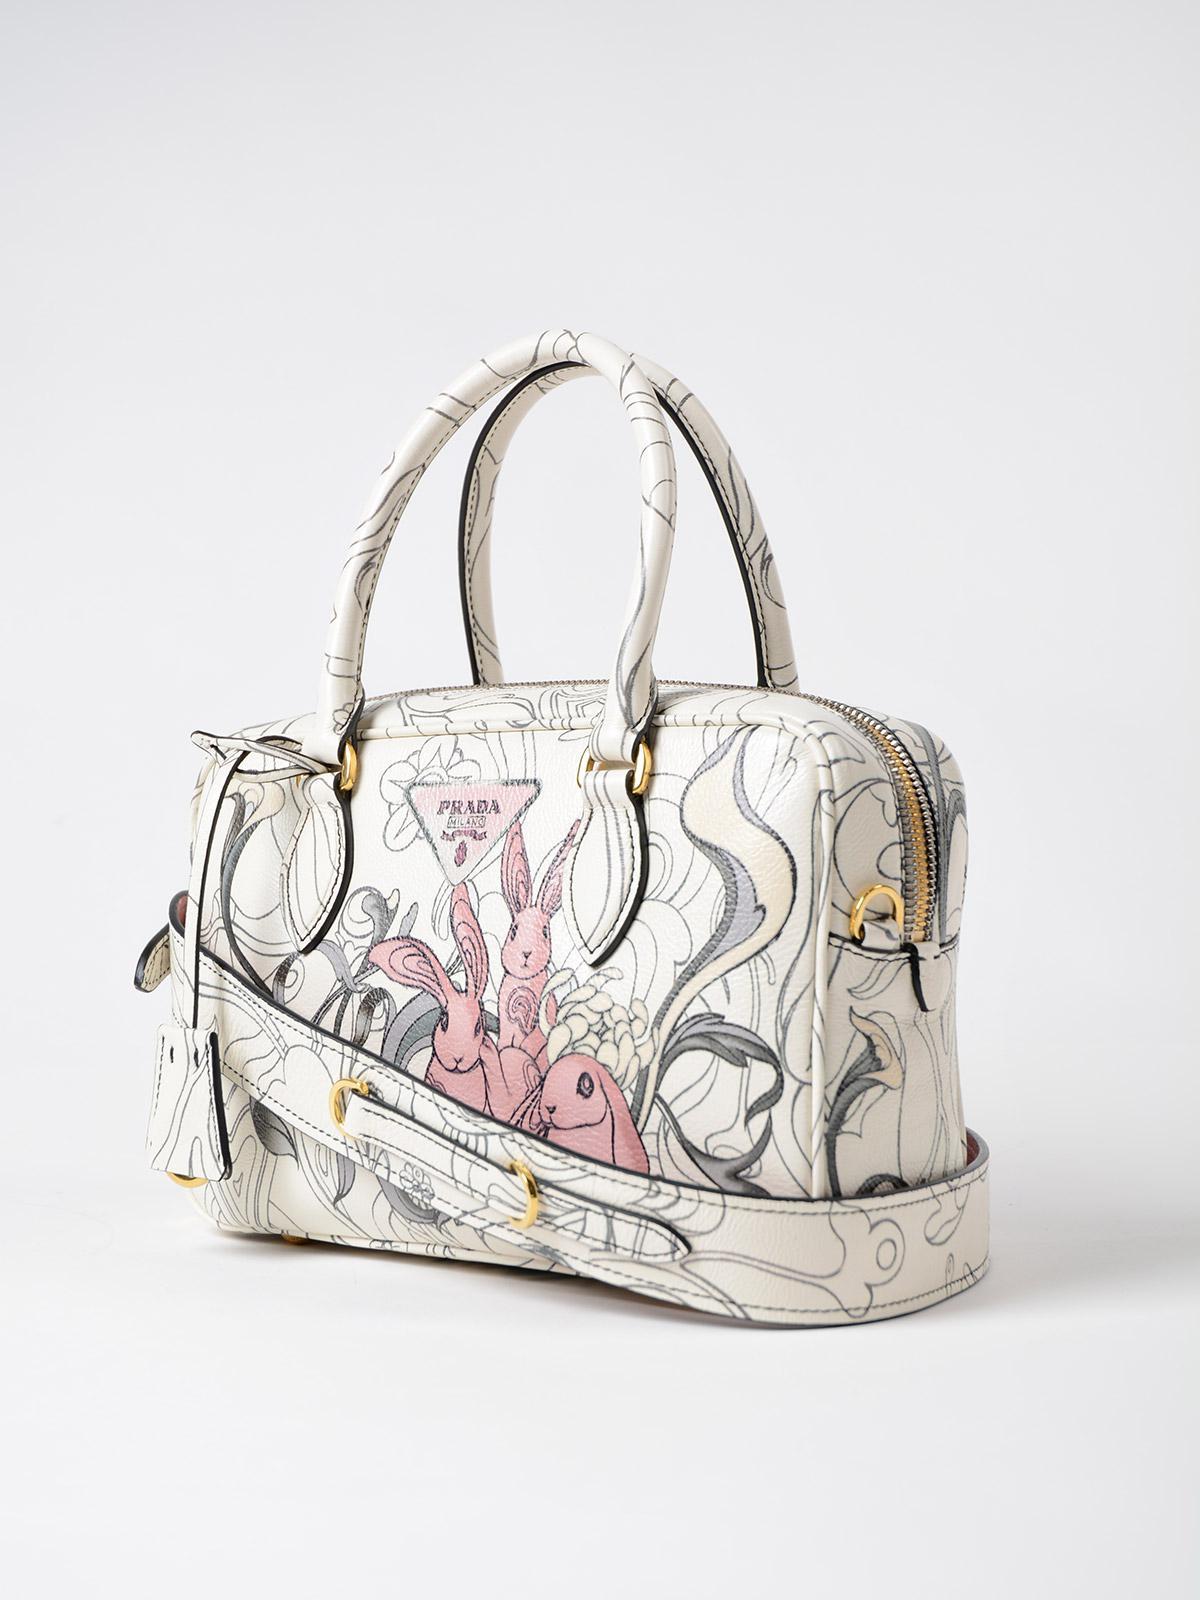 cfcdfcf5a16 italy prada white rabbit print leather tote bag 2aad4 d2444  denmark lyst  prada glace calf rabbit handbag b8d6d 8556d